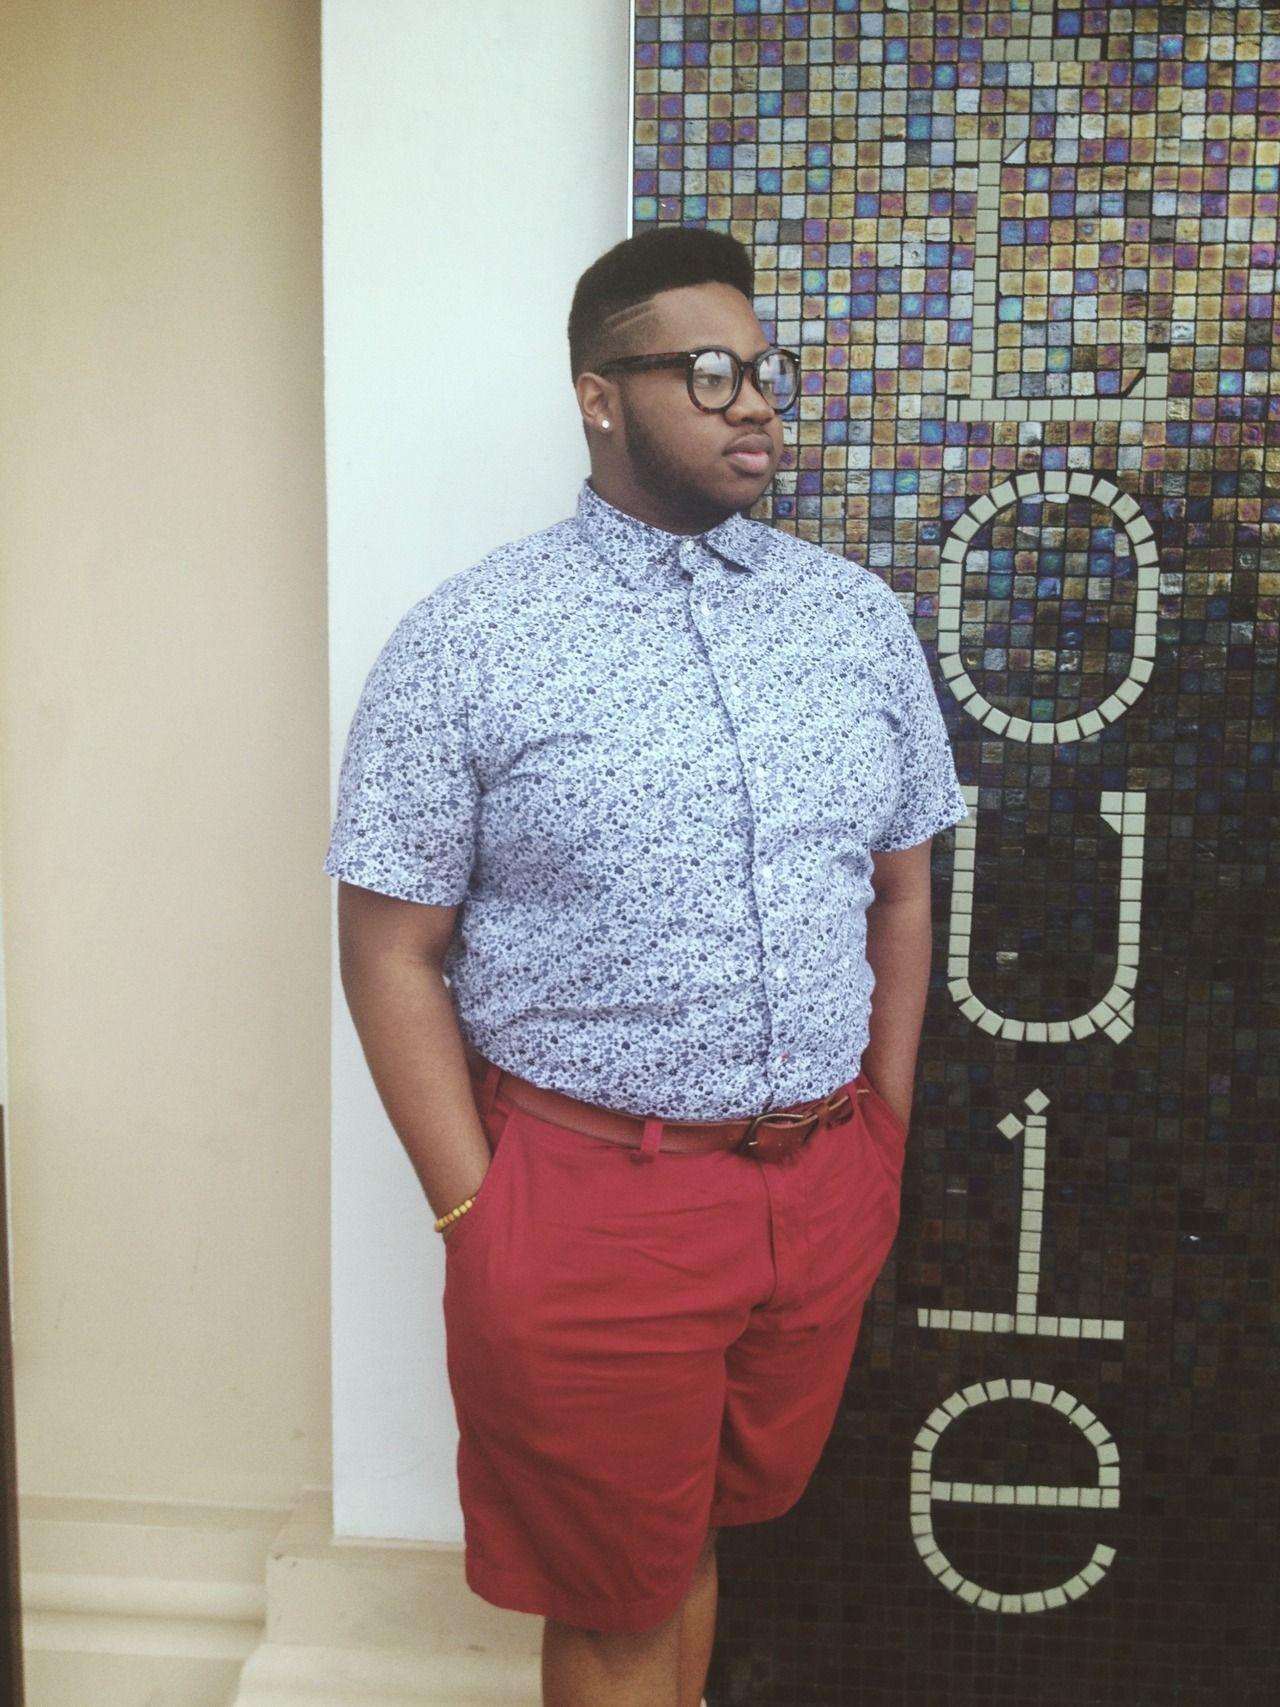 Black men haircuts tumblr harold cochran huntsville al ig coolashal  unclassifiedcool